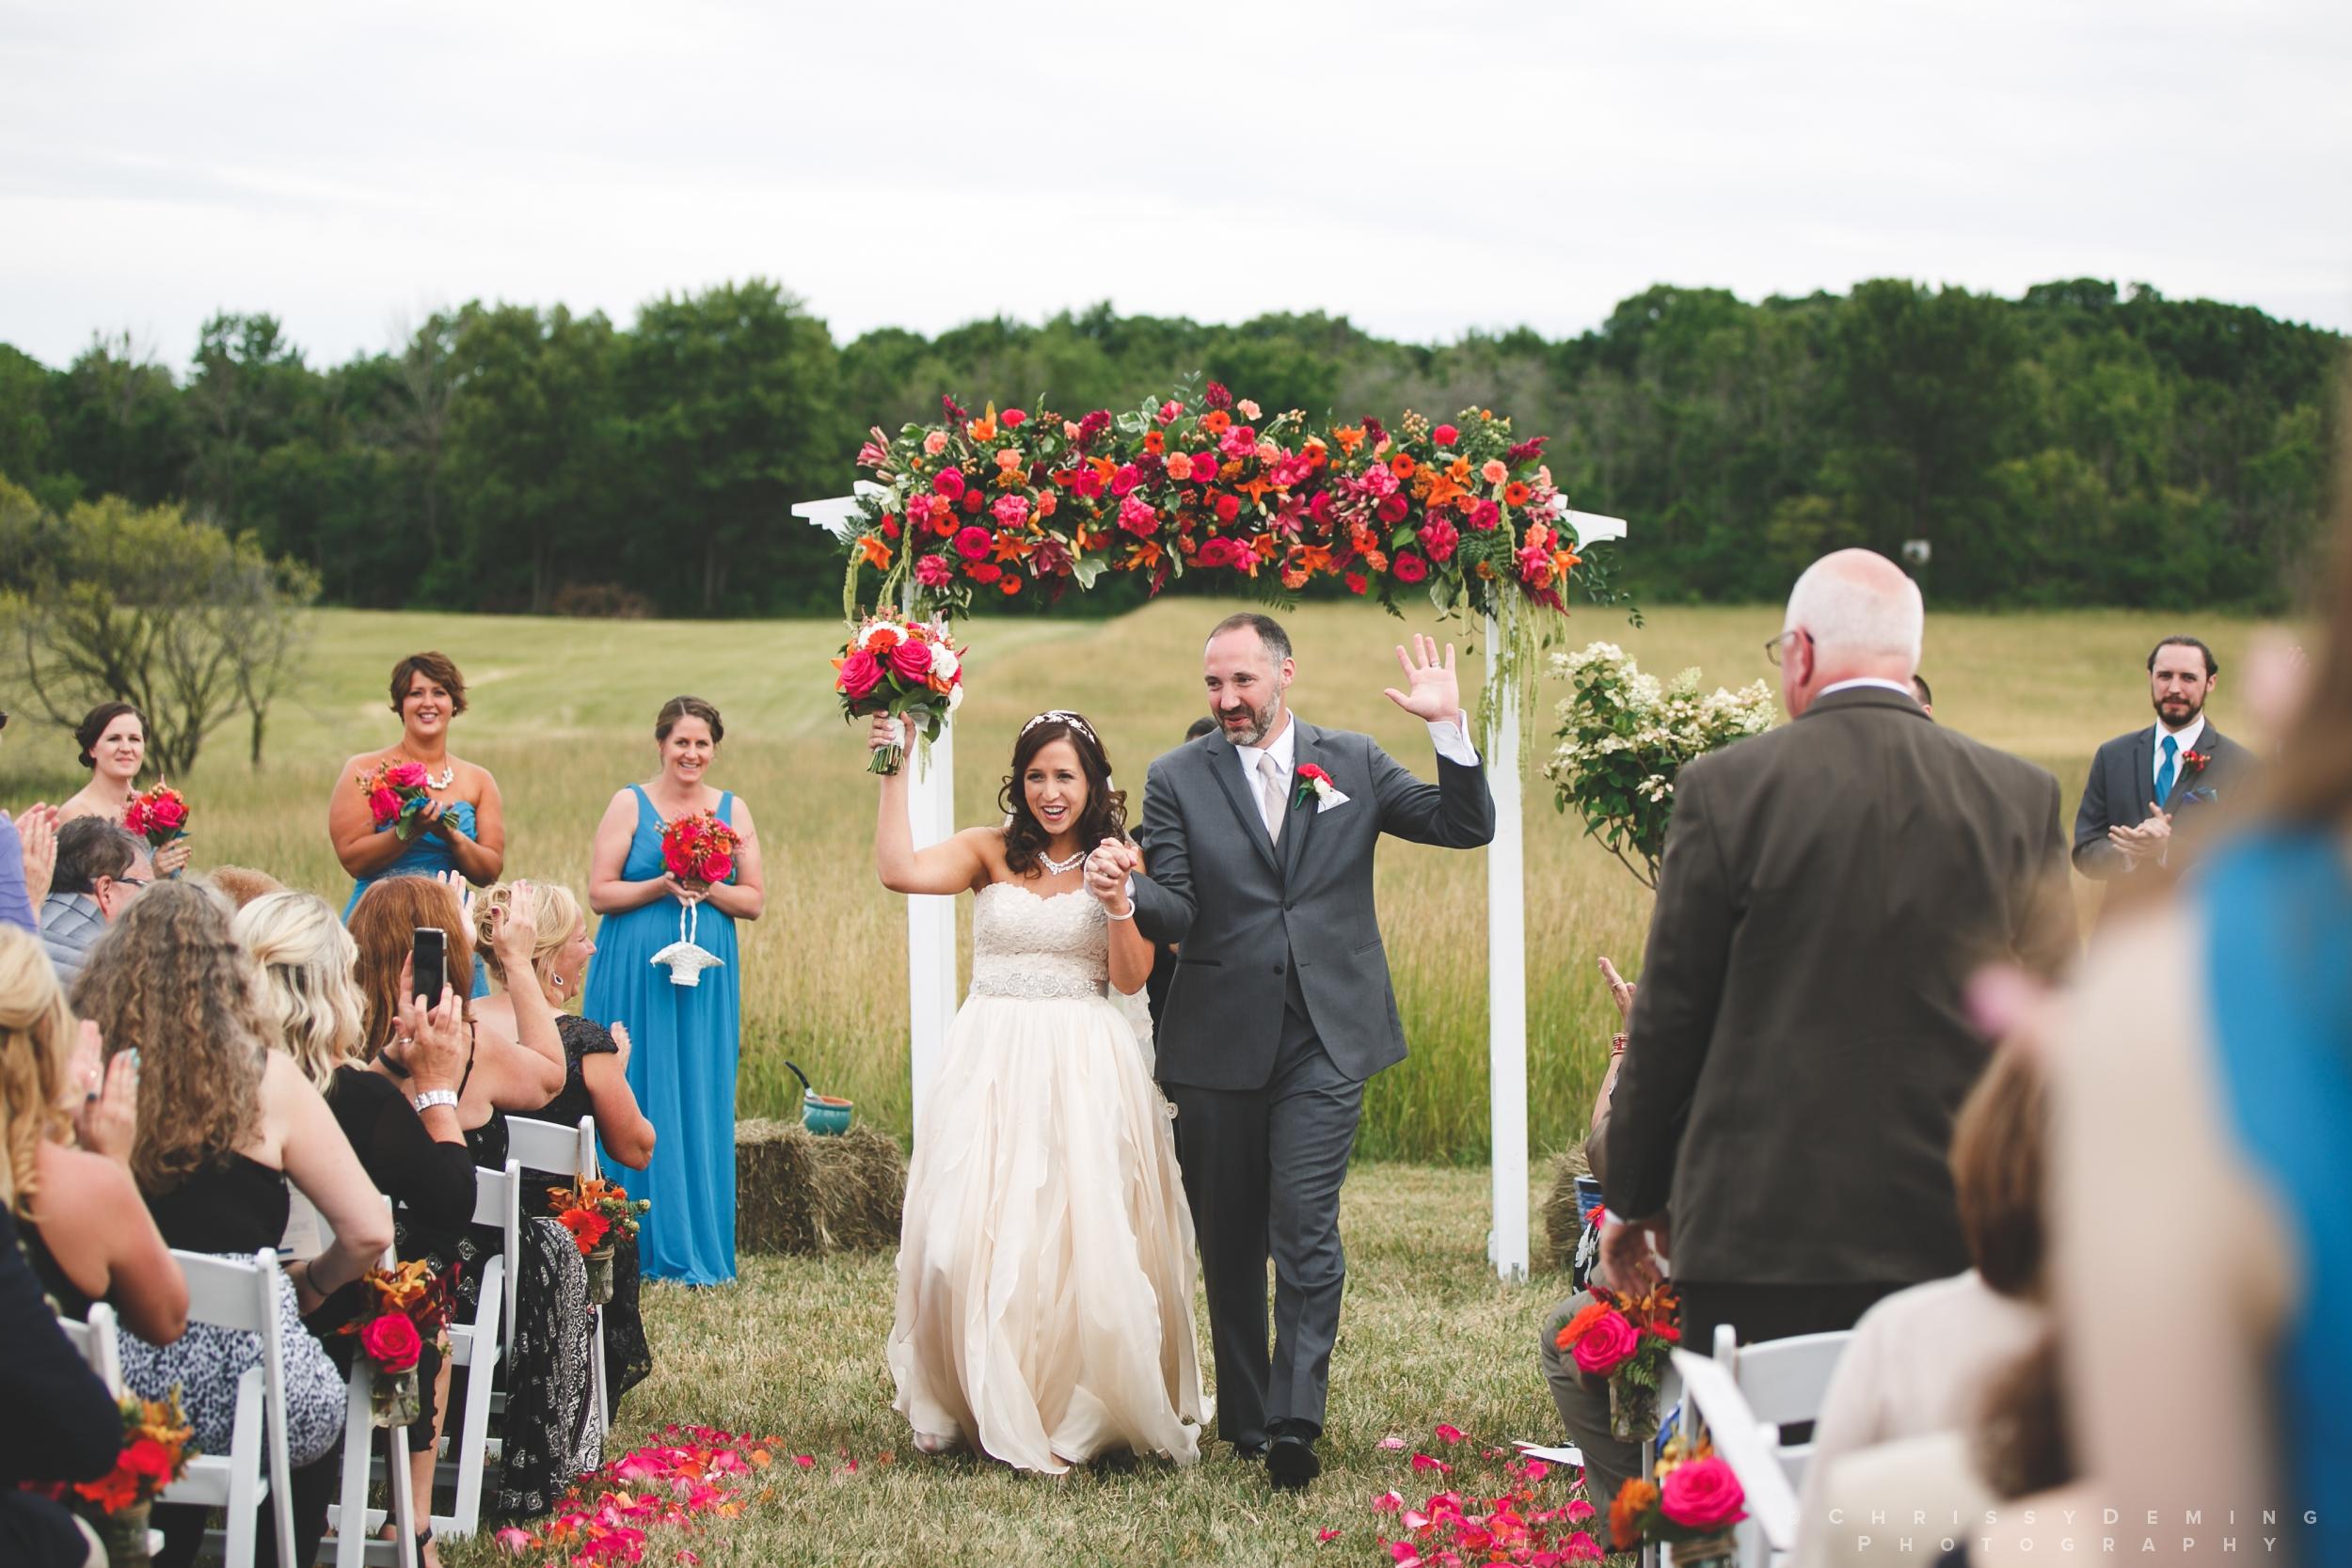 crete_IL_farm_wedding_photographer_0035.jpg